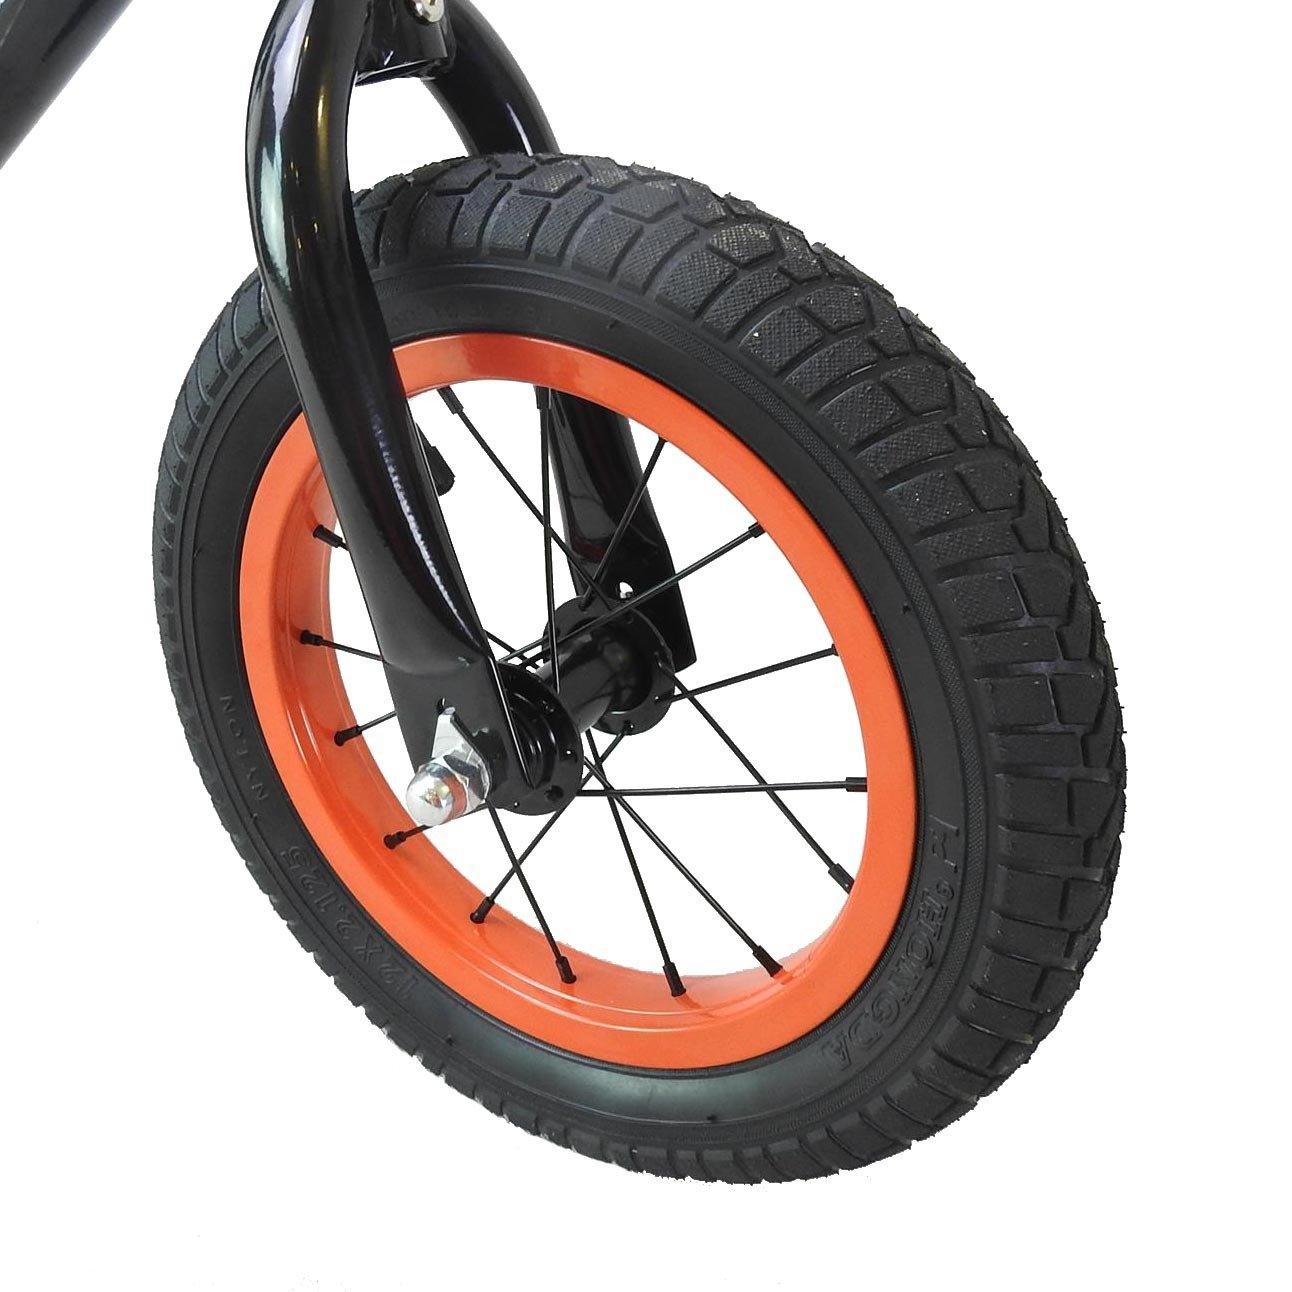 CyclingDeal Alloy Kids Push Balance No-Pedal Bike 12'' Black by CyclingDeal (Image #3)